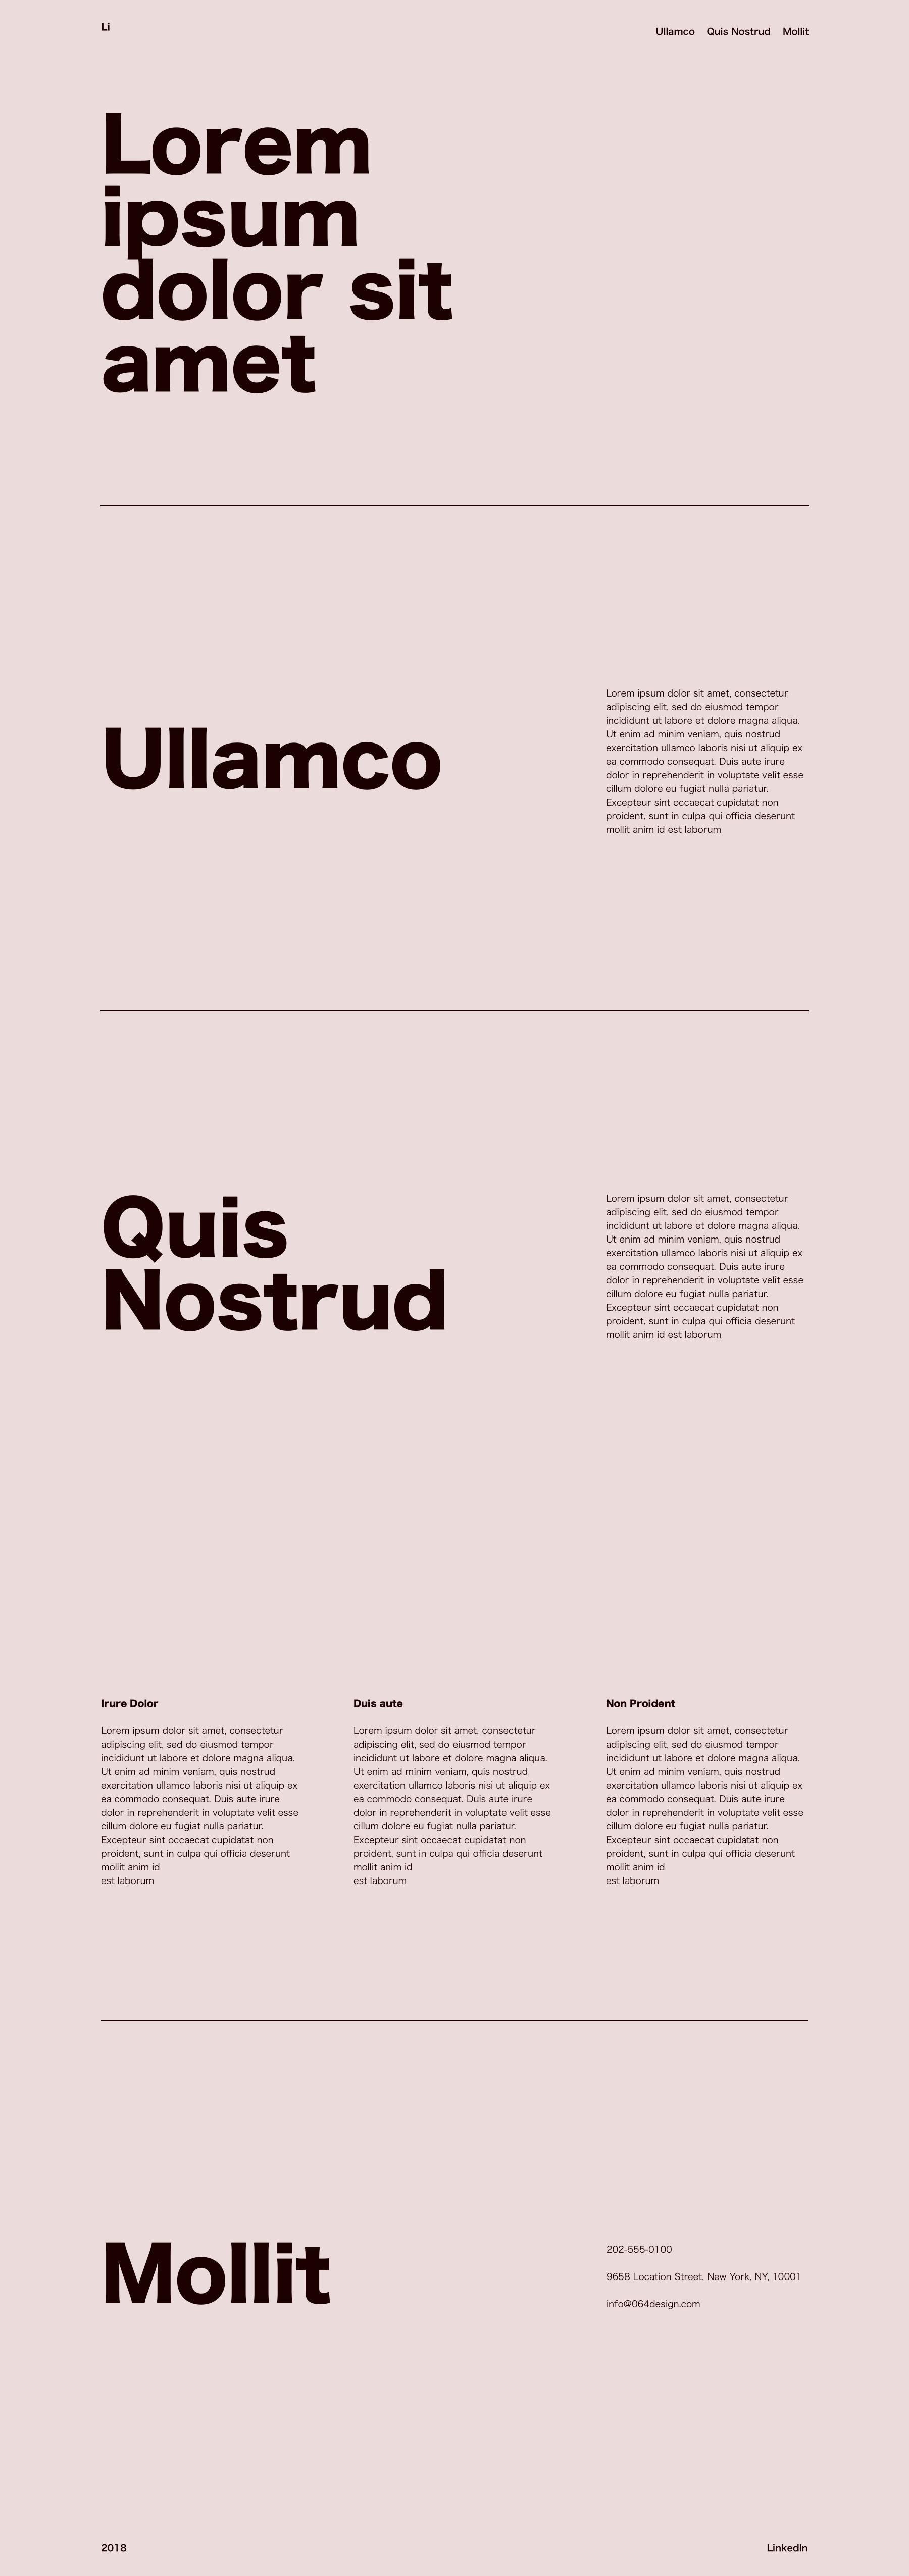 Resume Or Website Template White Design Web Webdesign Graphicdesign Minimal Swiss Portfolio Website Design Minimalist Web Design Typography Book Design